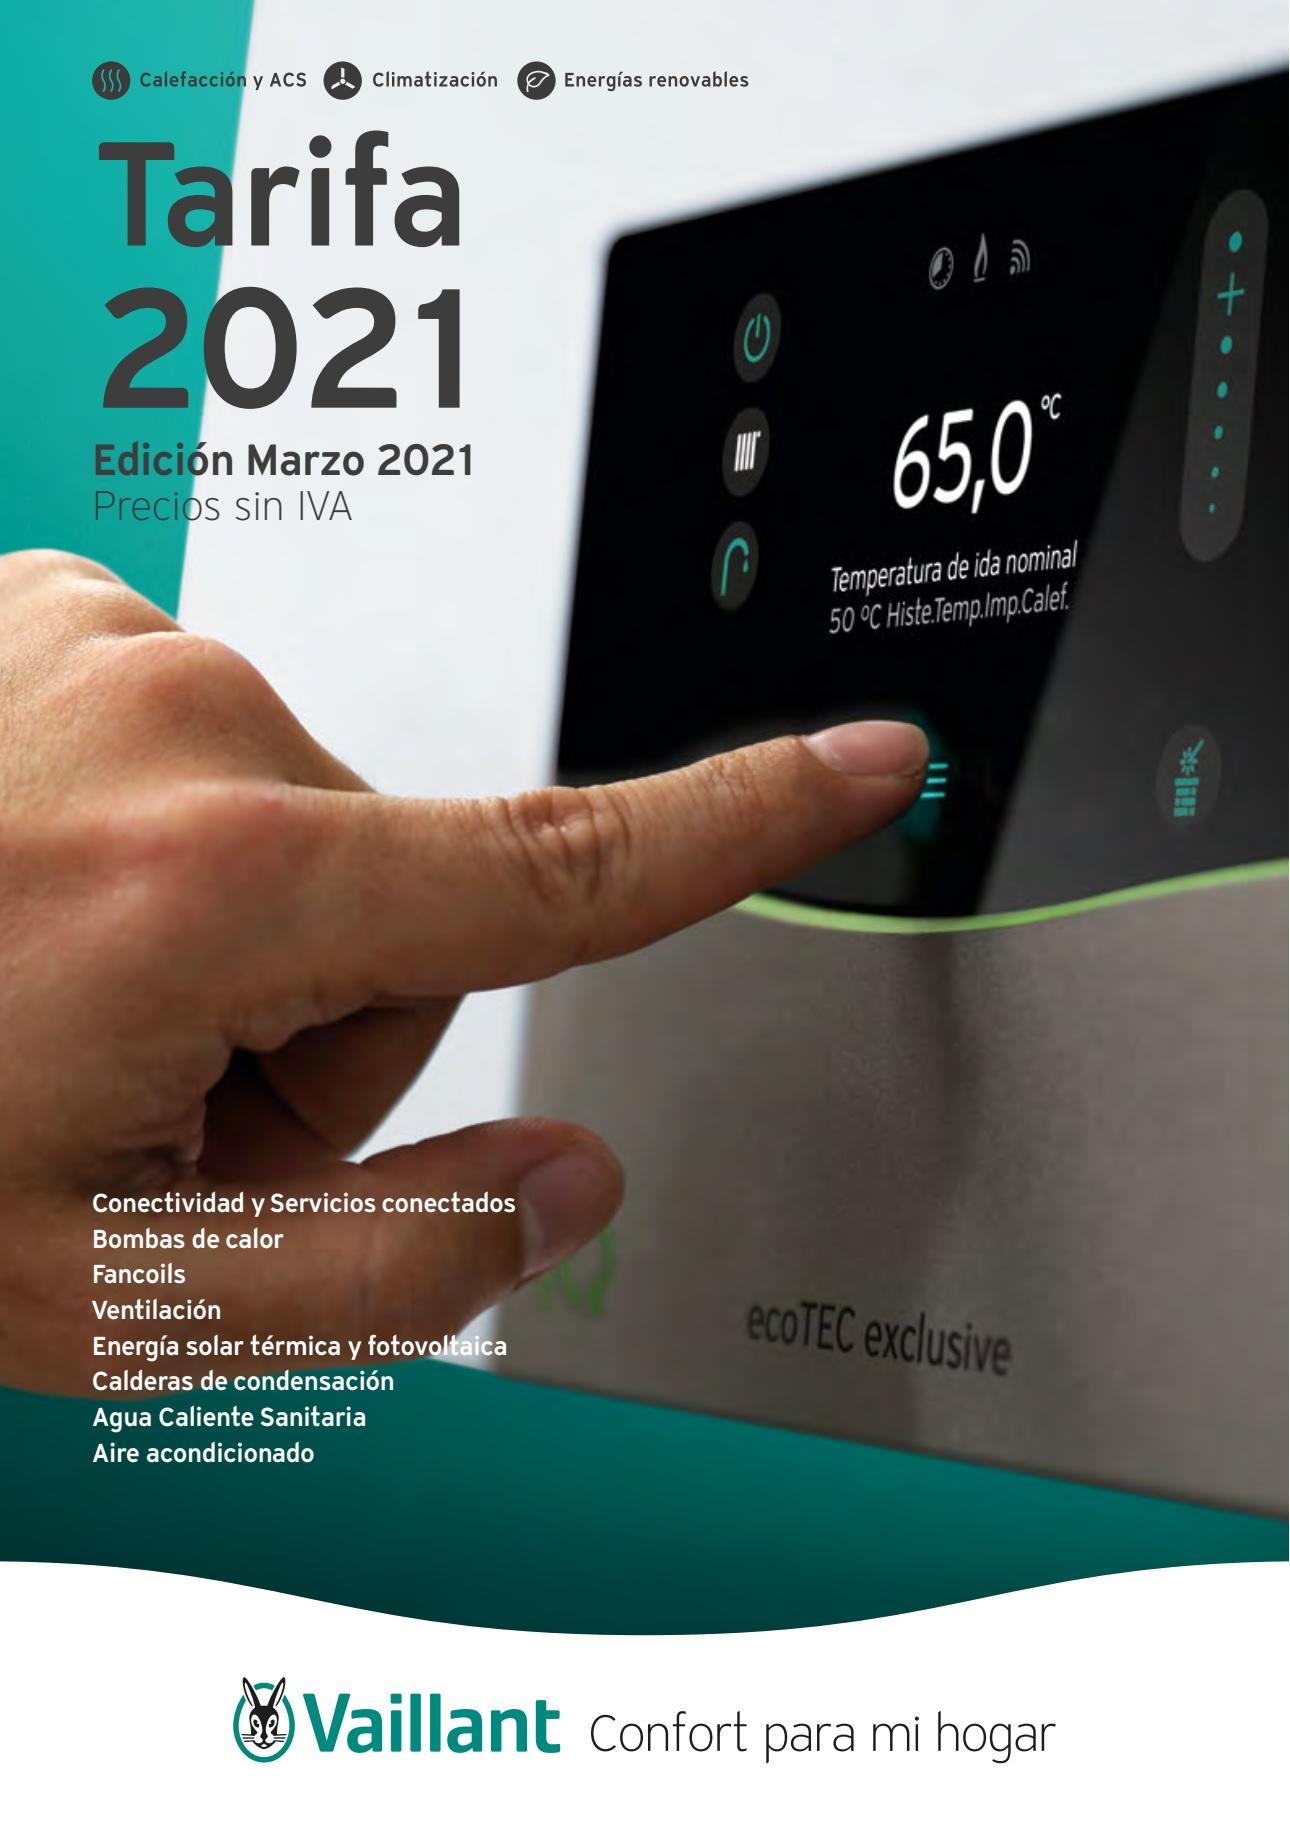 Tarifa Vaillant 2021